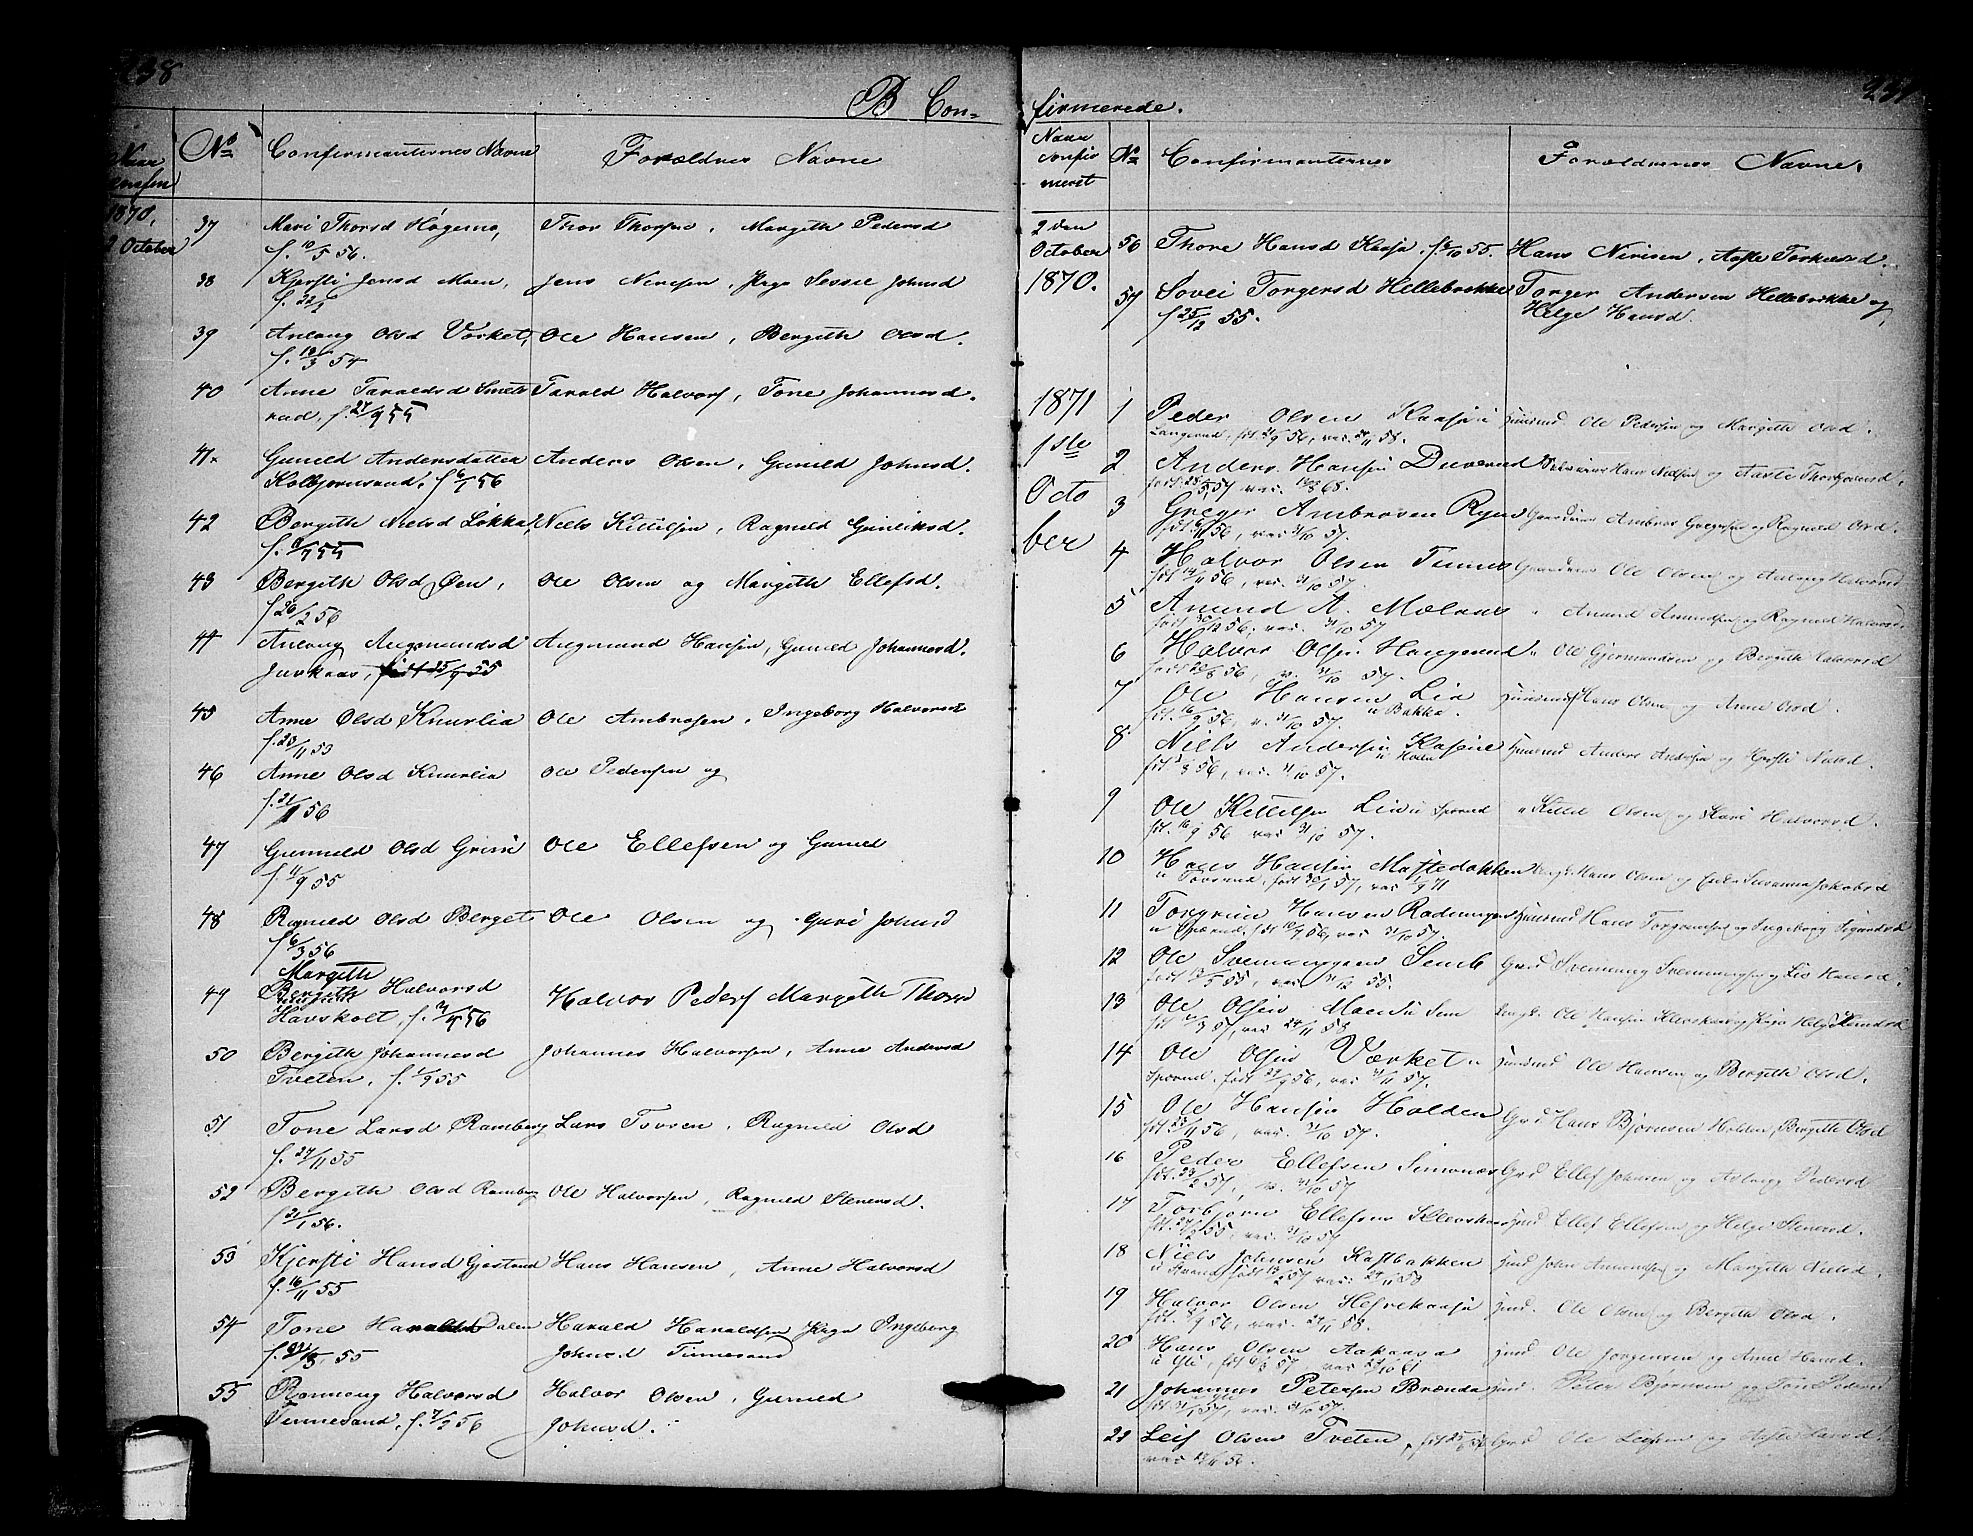 SAKO, Heddal kirkebøker, G/Ga/L0001: Klokkerbok nr. I 1, 1866-1878, s. 238-239